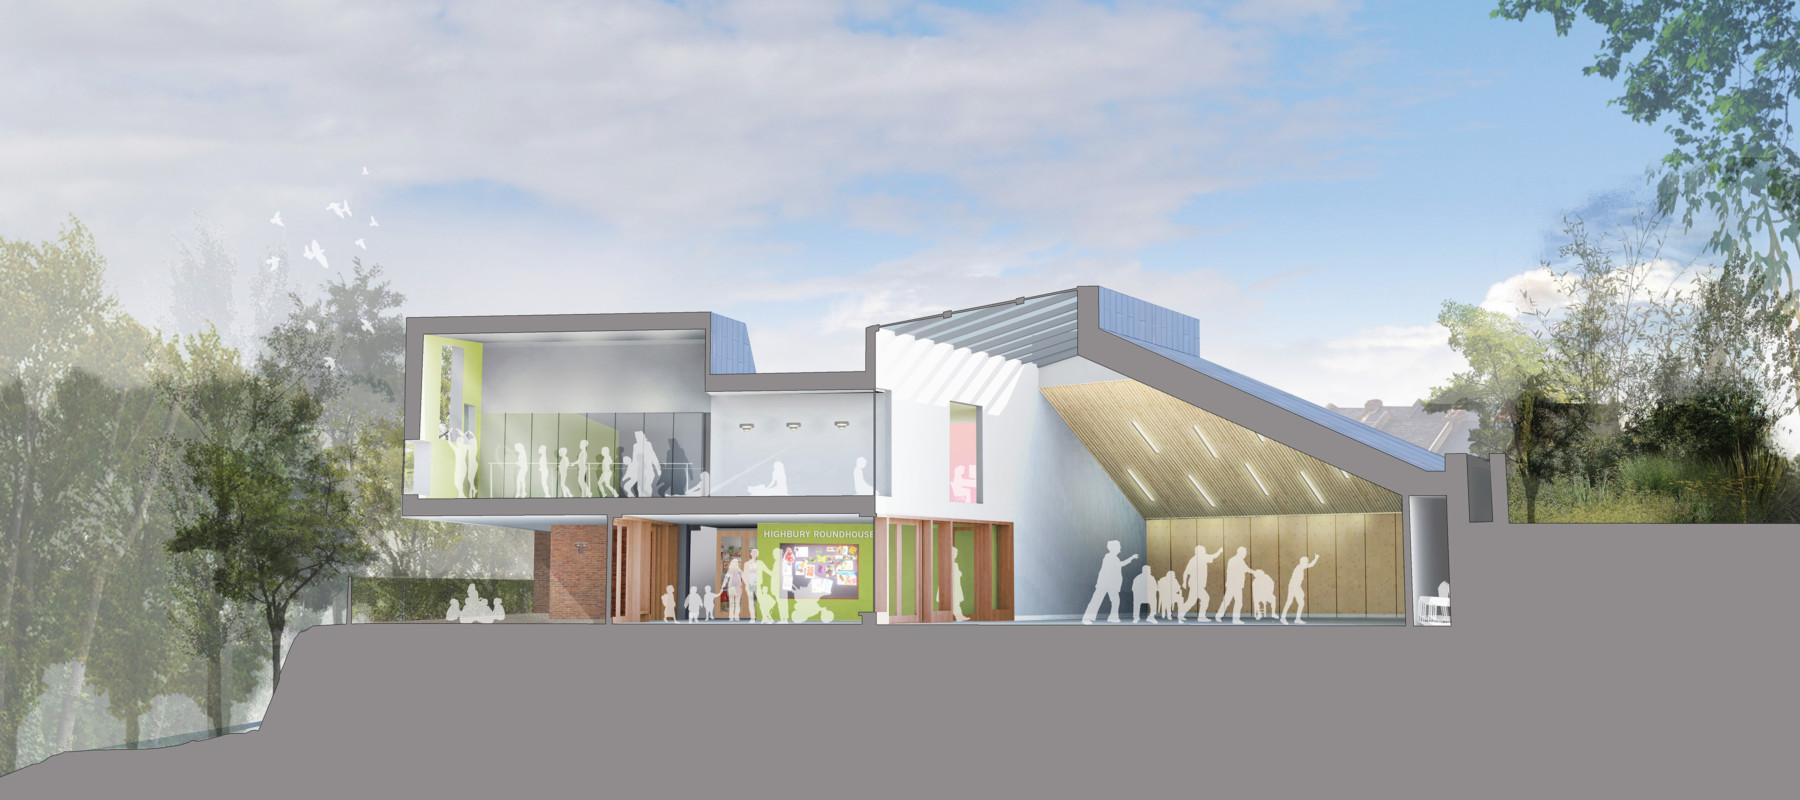 Sarah Wigglesworth Architects Section